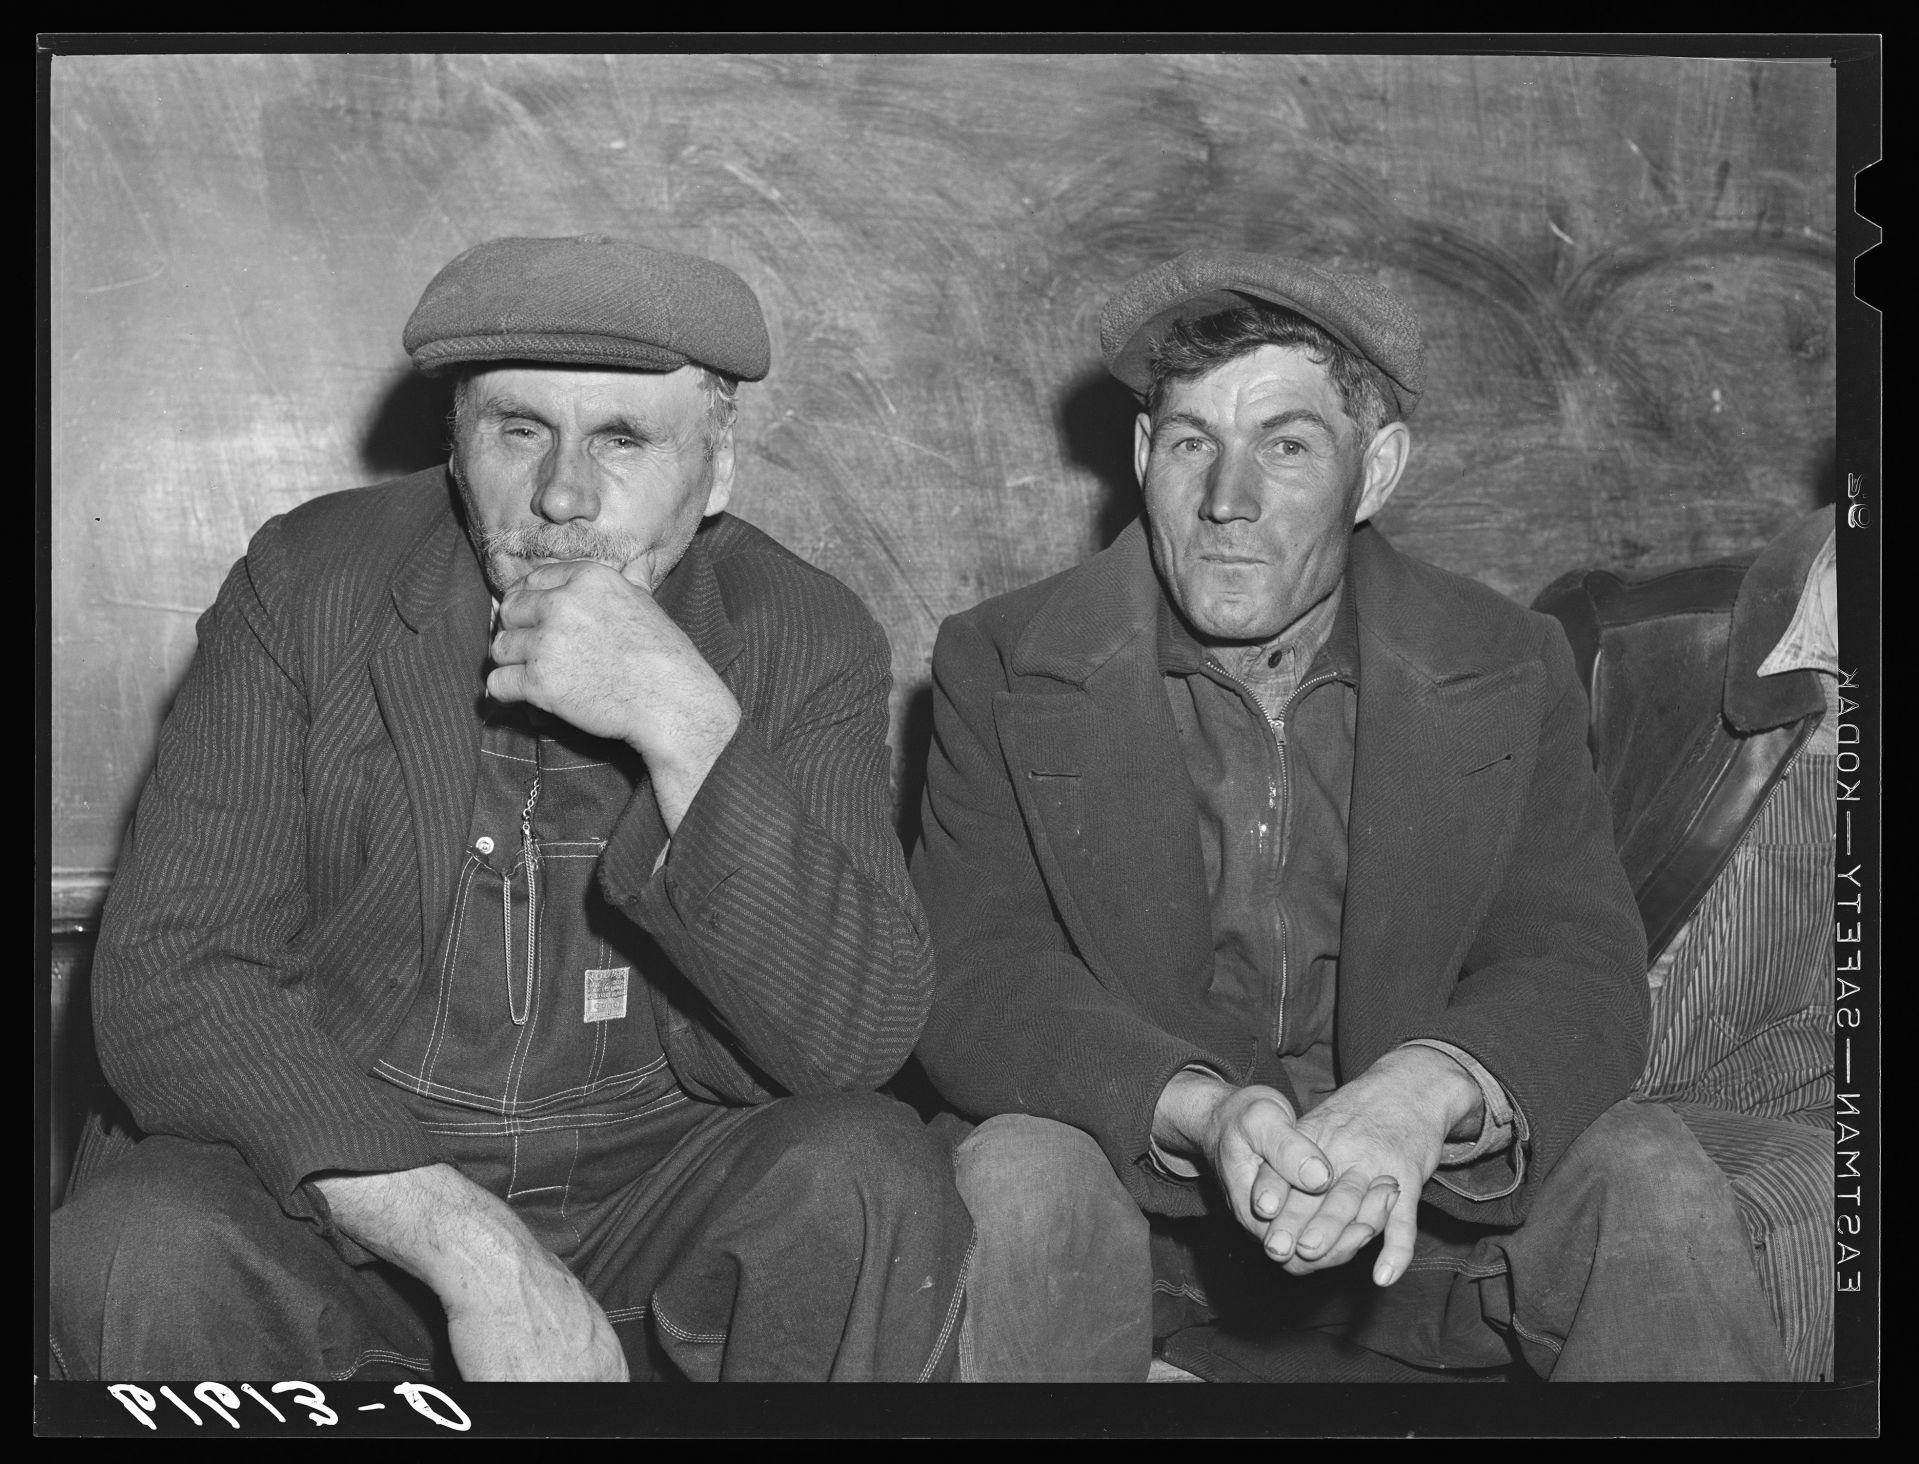 https://hdl.loc.gov/loc.pnp/fsa.8c18110   German-Russian farmers waiting to vote, election day, 1940. Beaver Creek precinct, McIntosh County, North Dakota  Vachon, John, photographer. German-Russian farmers waiting to vote, election day, . Beaver Creek precinct, McIntosh County, North Dakota. McIntosh County McIntosh County. North Dakota United States, 1940. Nov. Photograph. https://www.loc.gov/item/2017811048/.